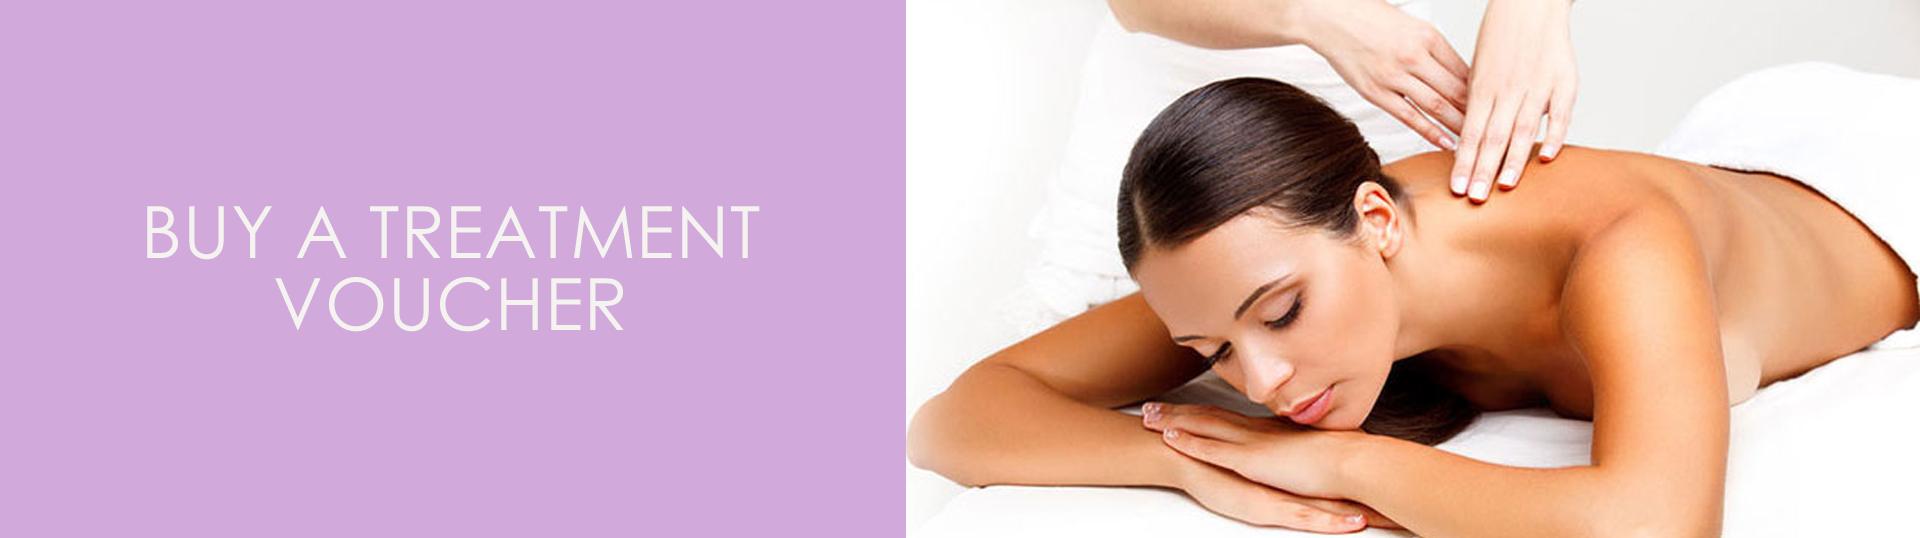 Buy a Treatment Gift Voucher